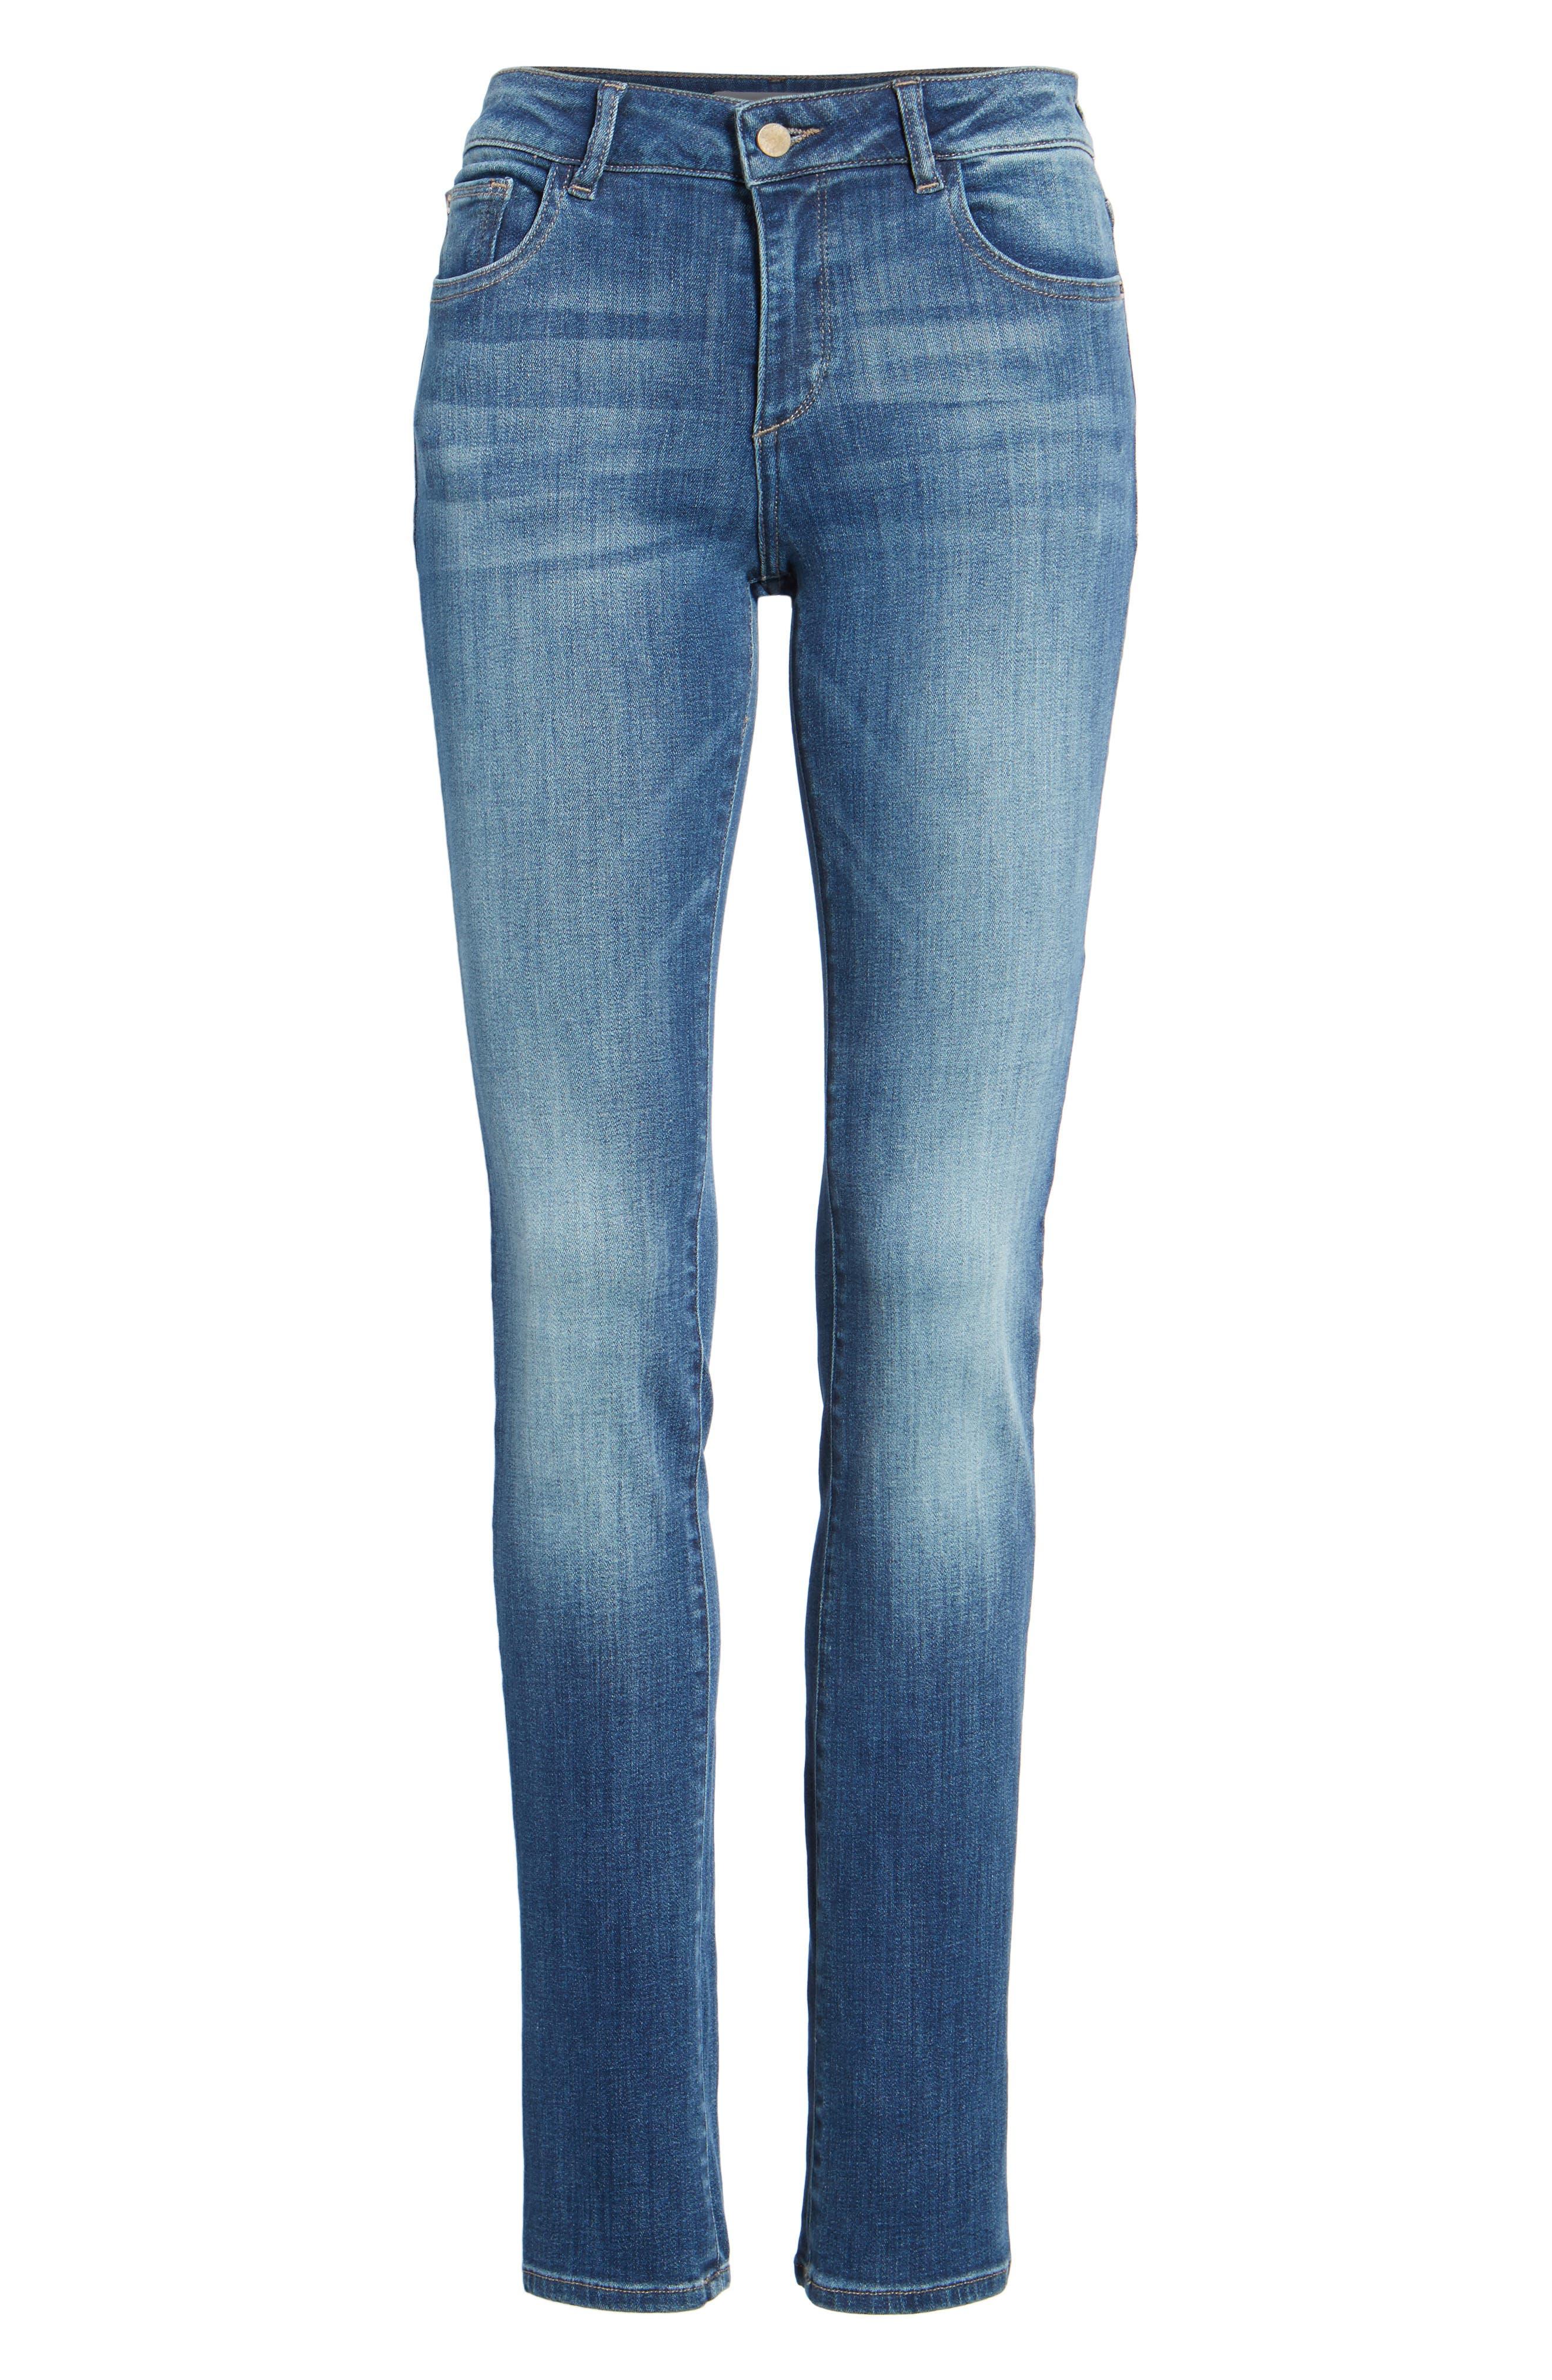 Mara Straight Leg Jeans,                             Alternate thumbnail 7, color,                             425